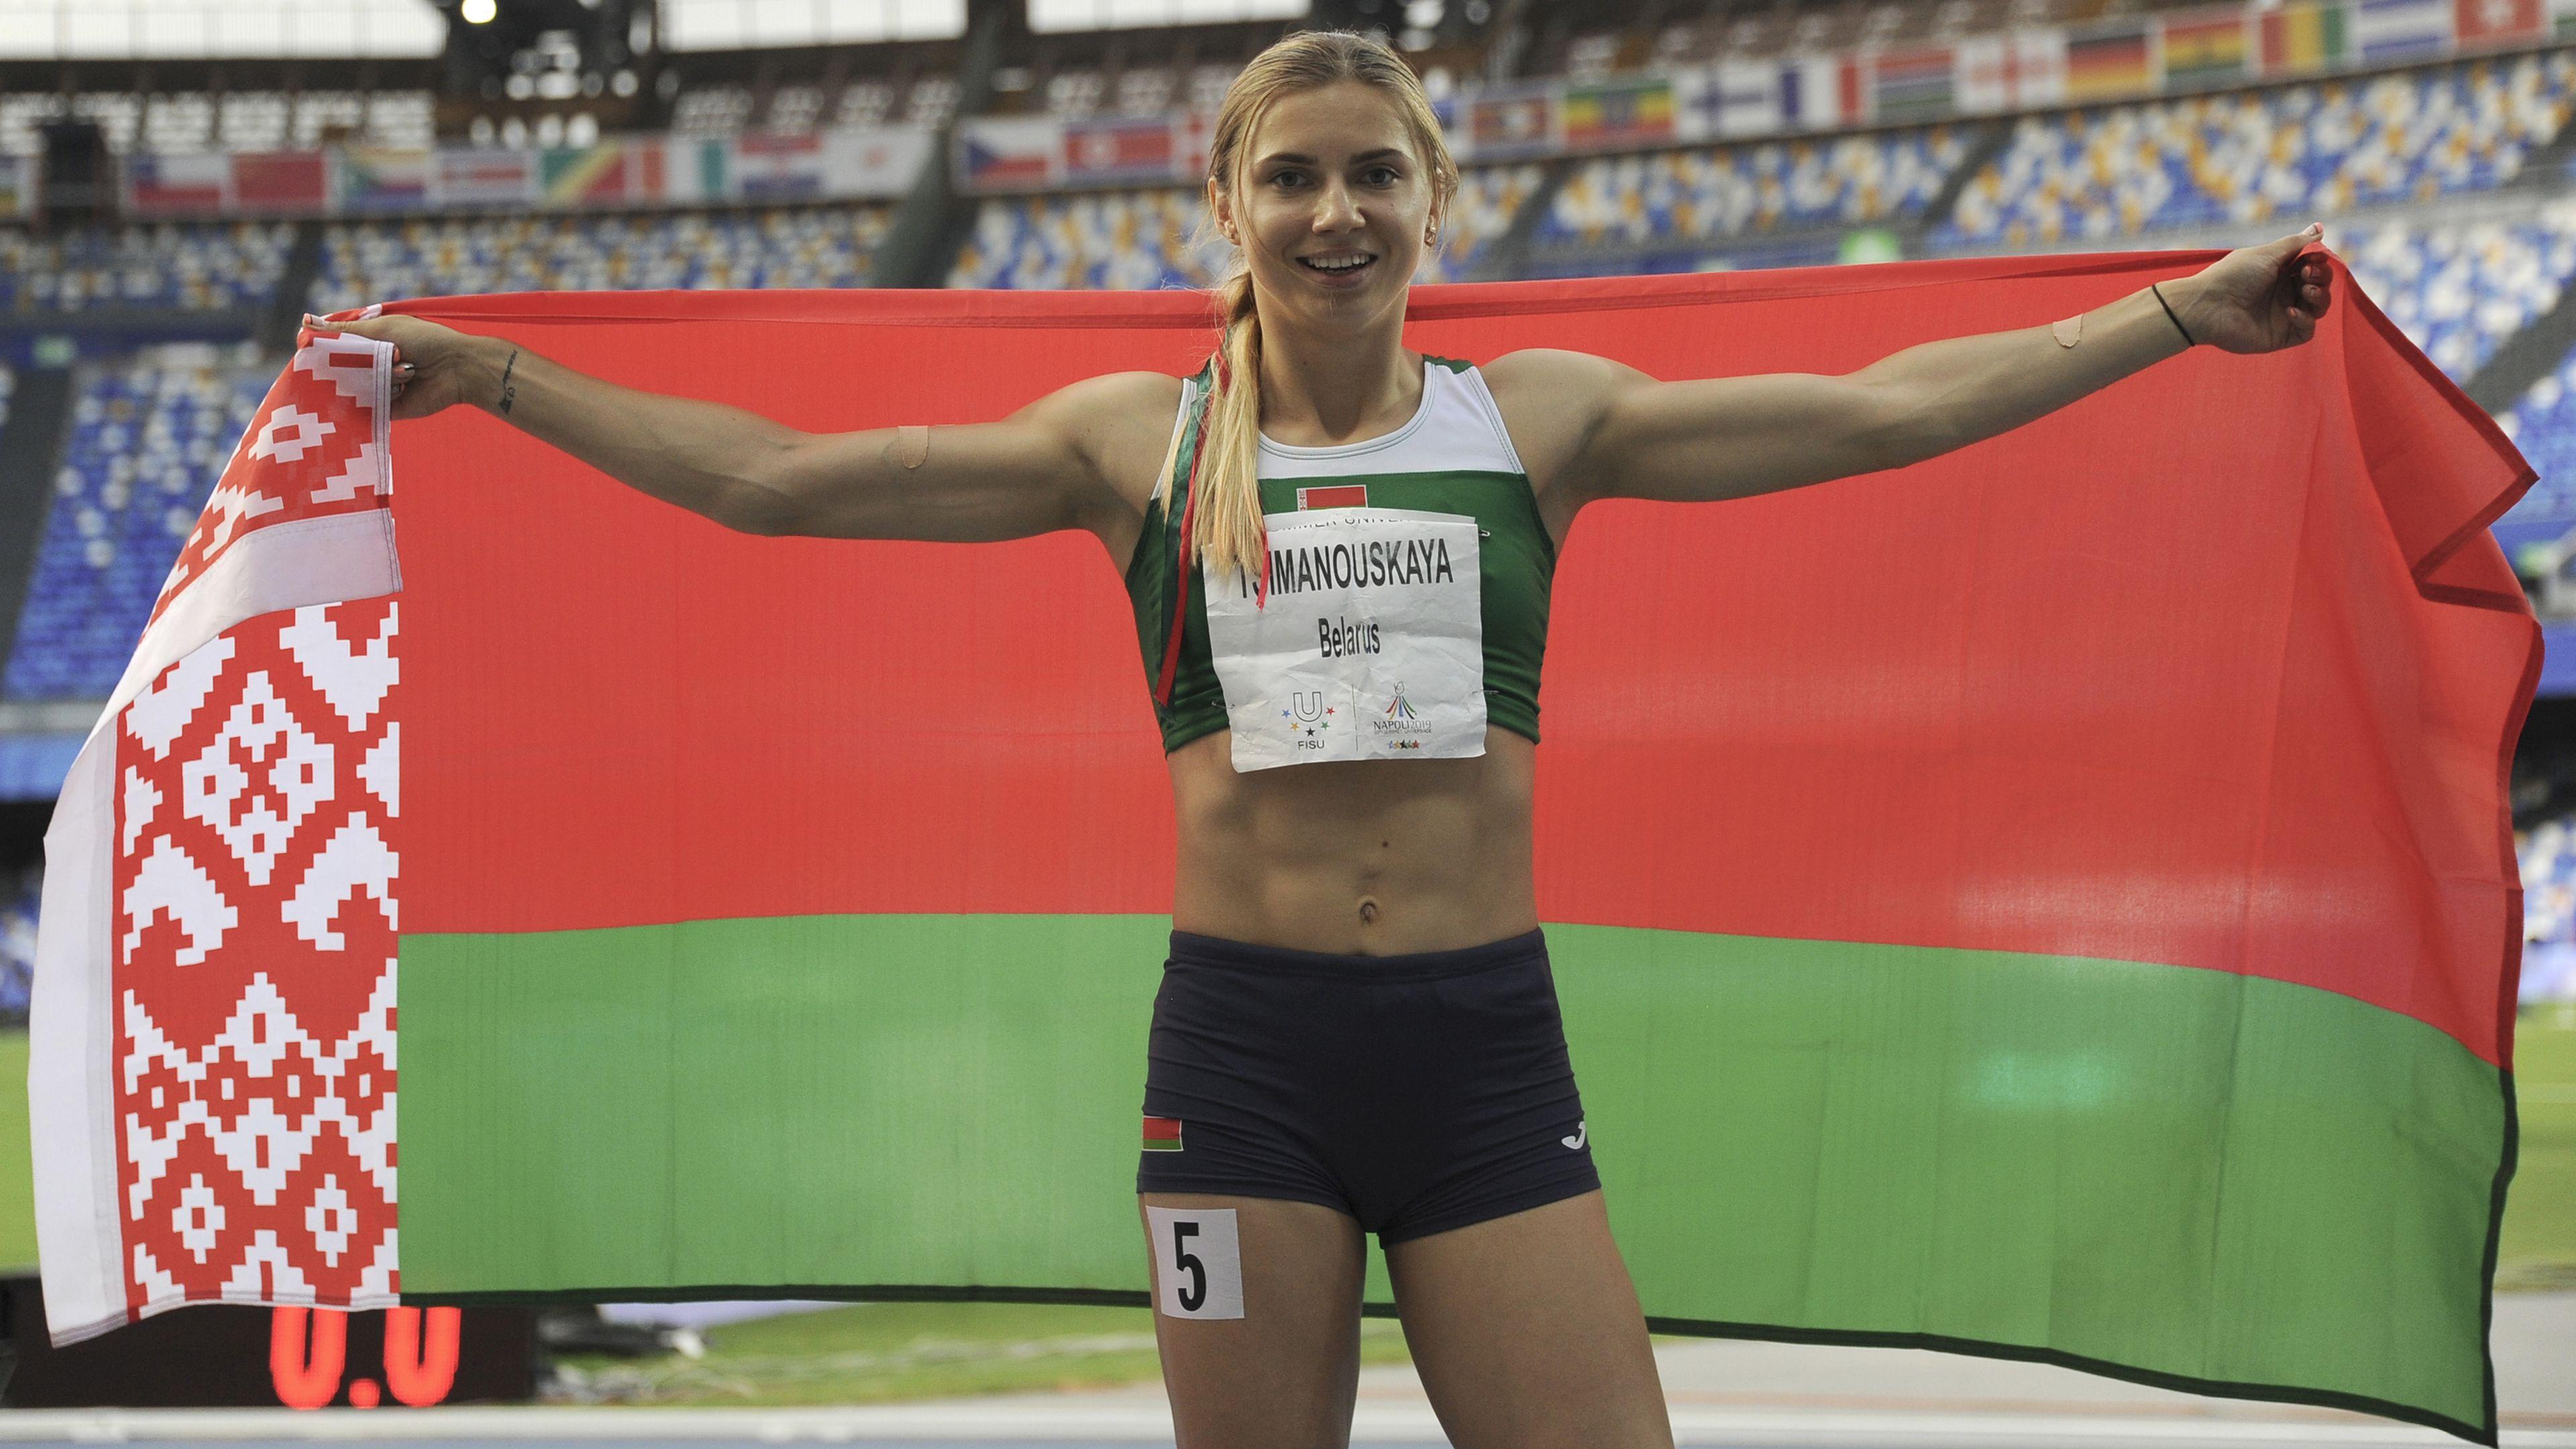 Tokyo 2021: Krystsina Tsimanouskaya says she would face punishment if she returned to Belarus